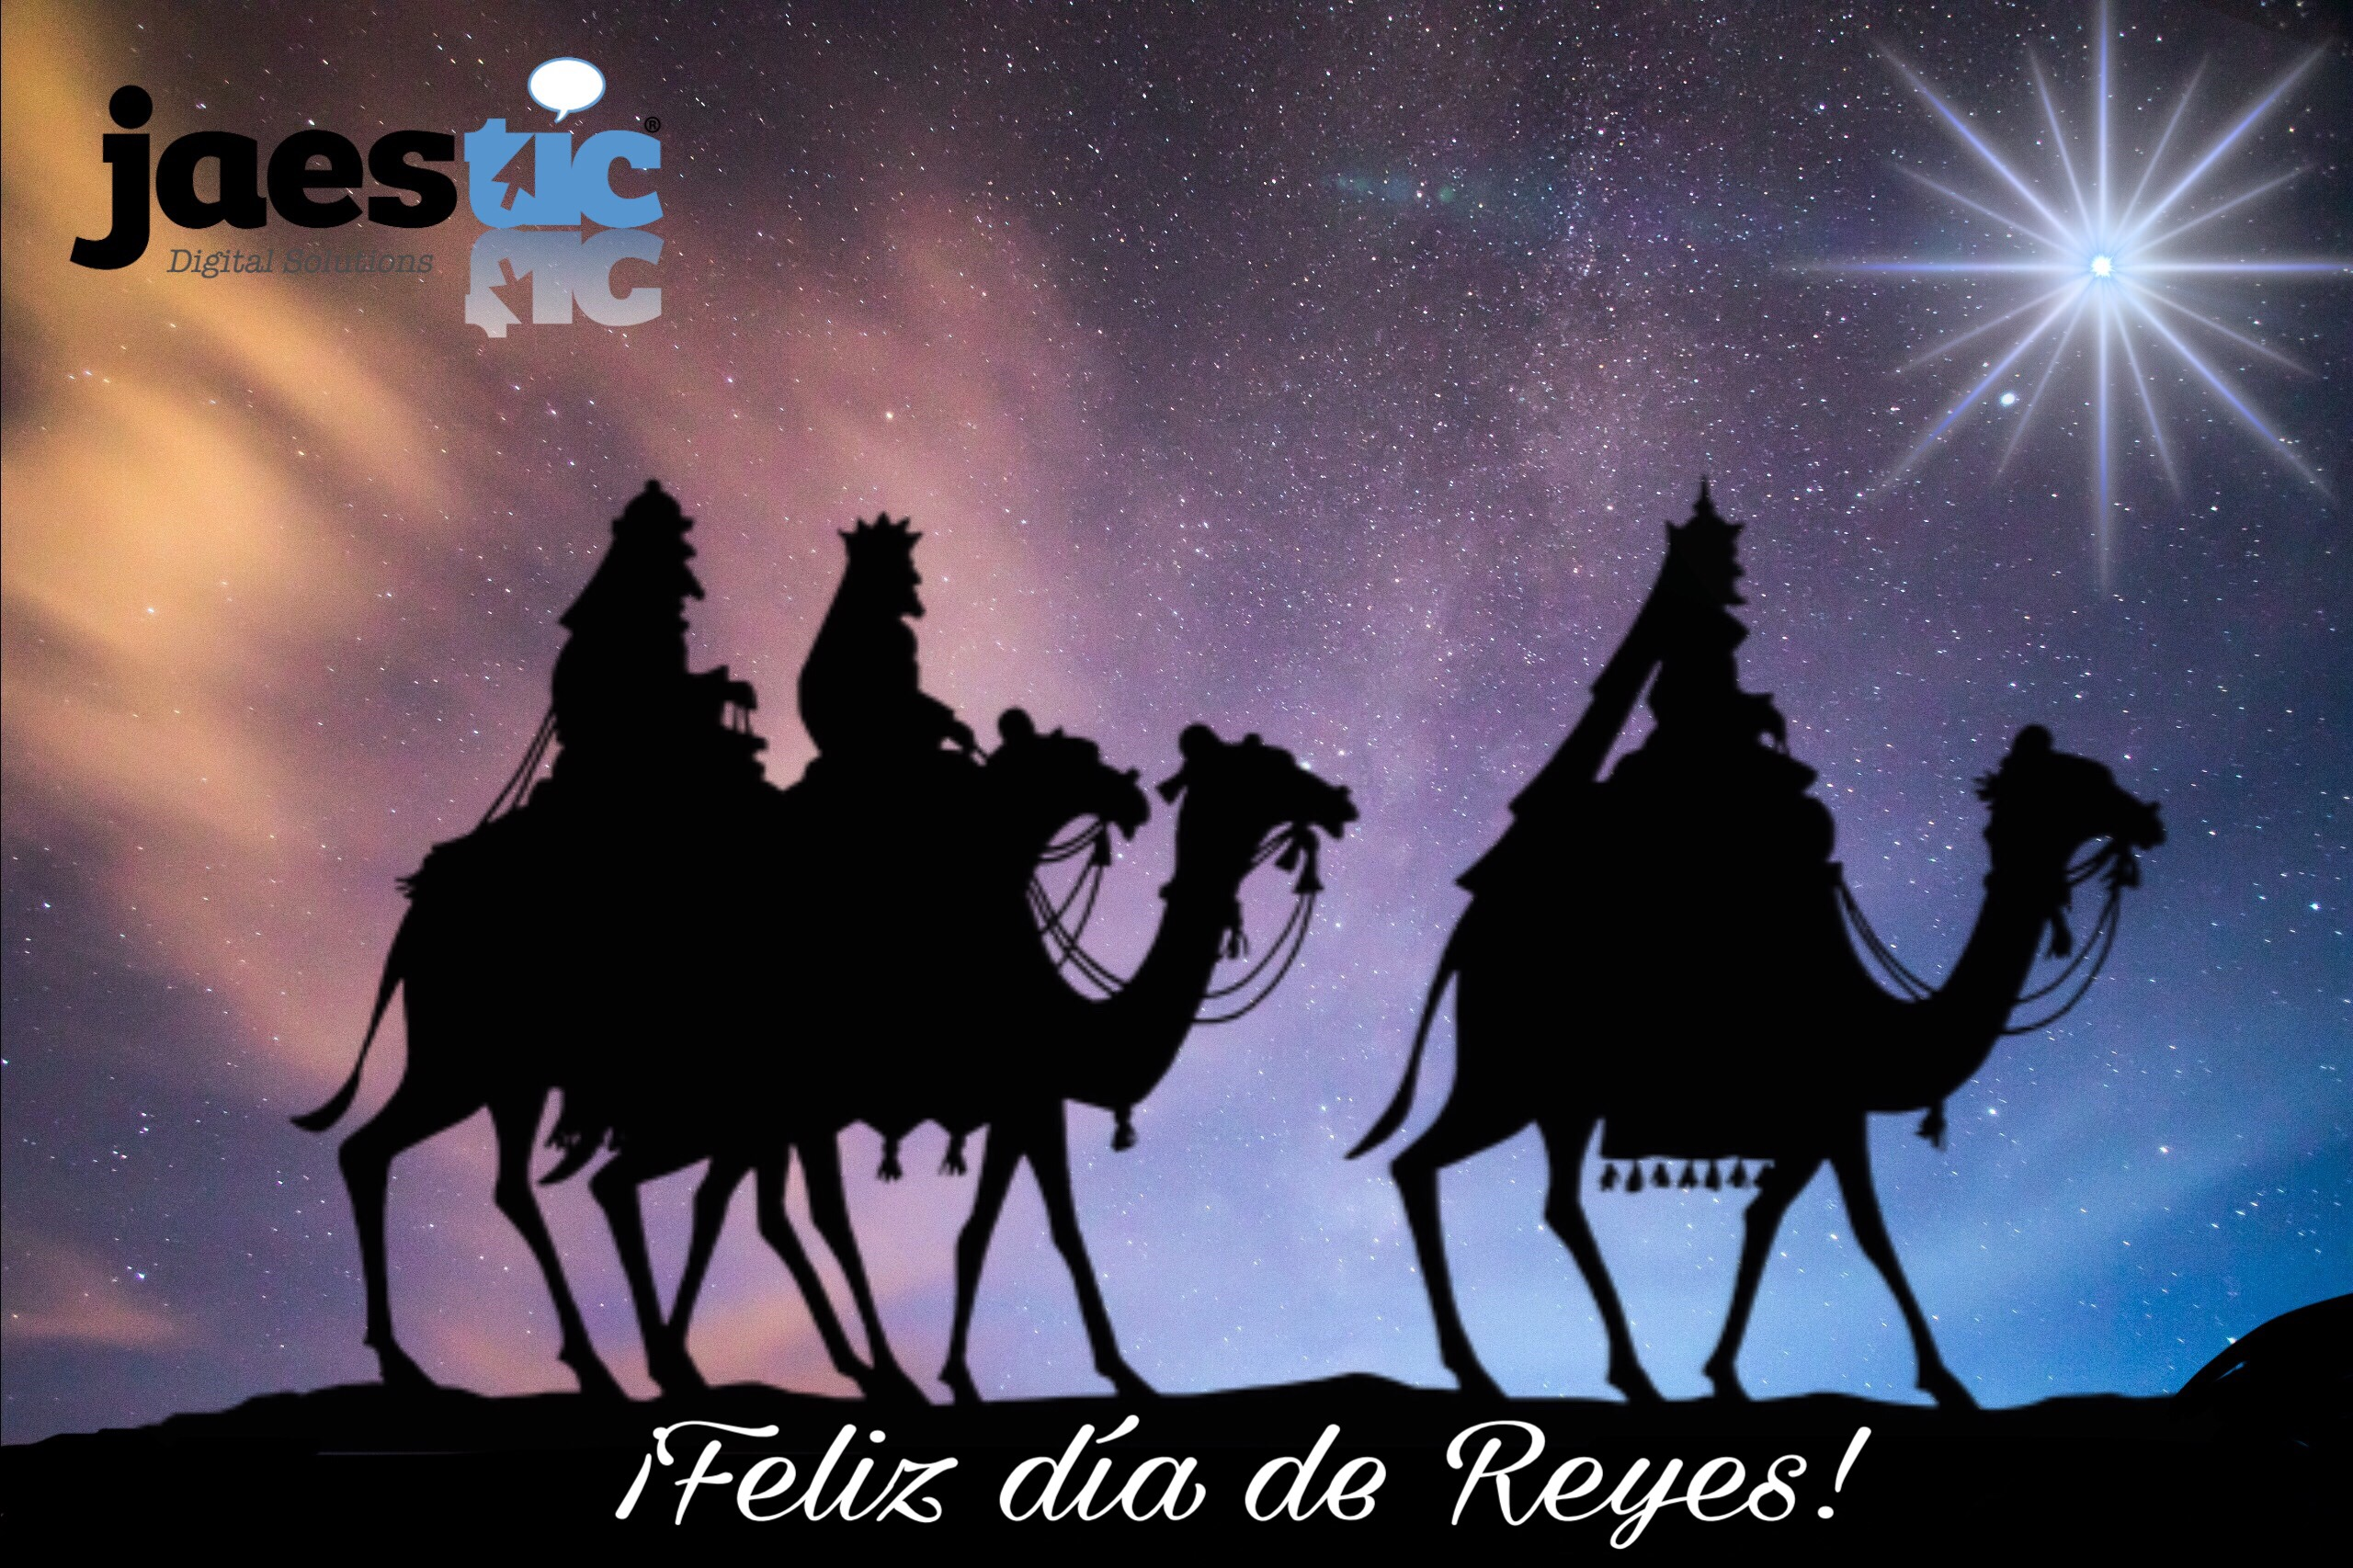 Jaestic us desitja Feliç dia de Reis!